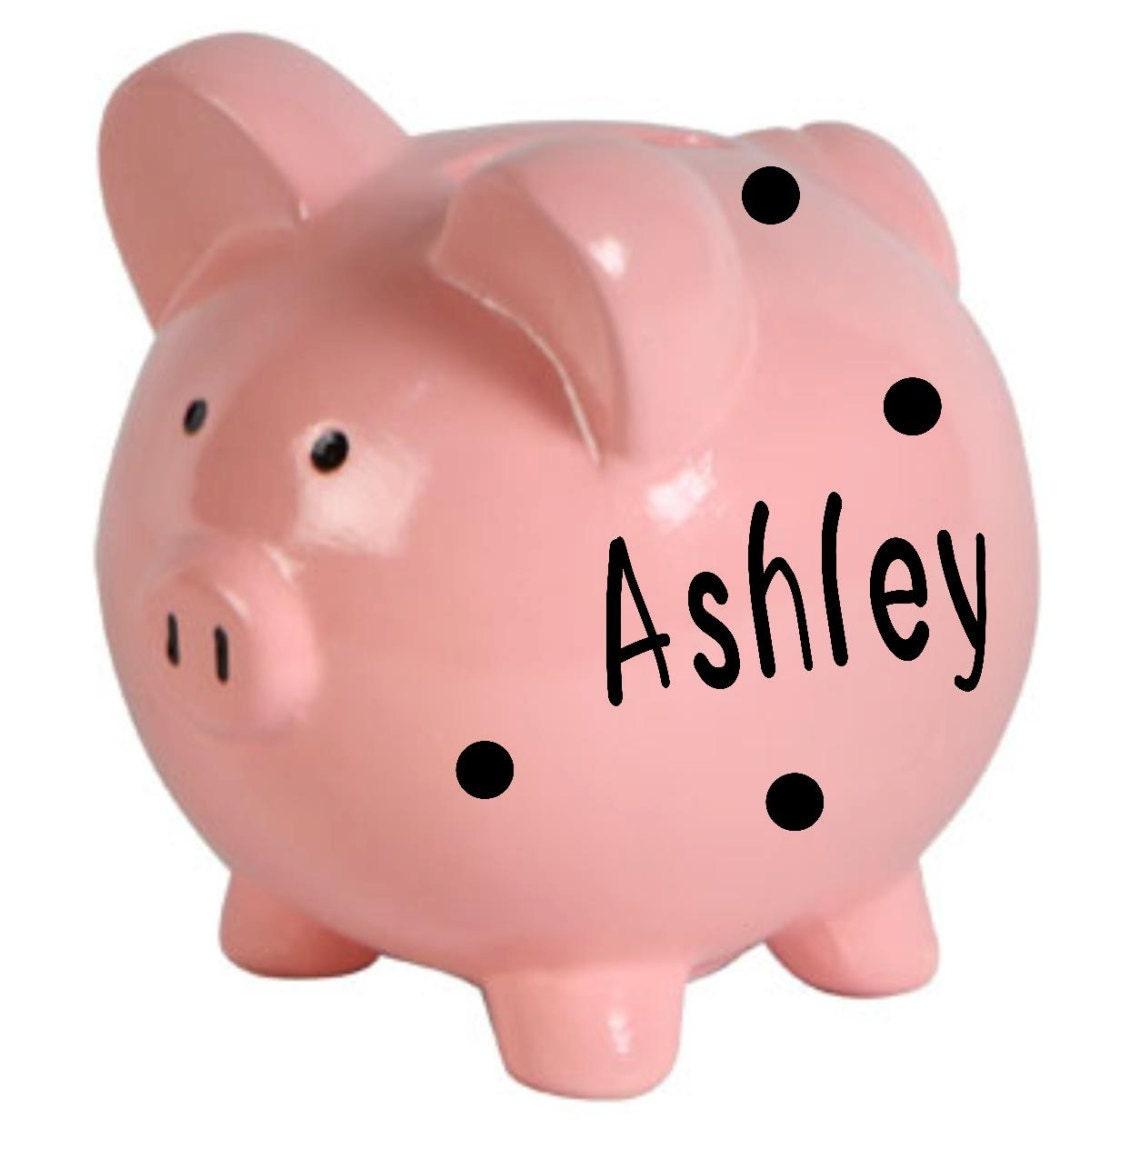 Personalized piggy bank ceramic piggy bank piggy bank boy - Ceramic piggy banks for boys ...